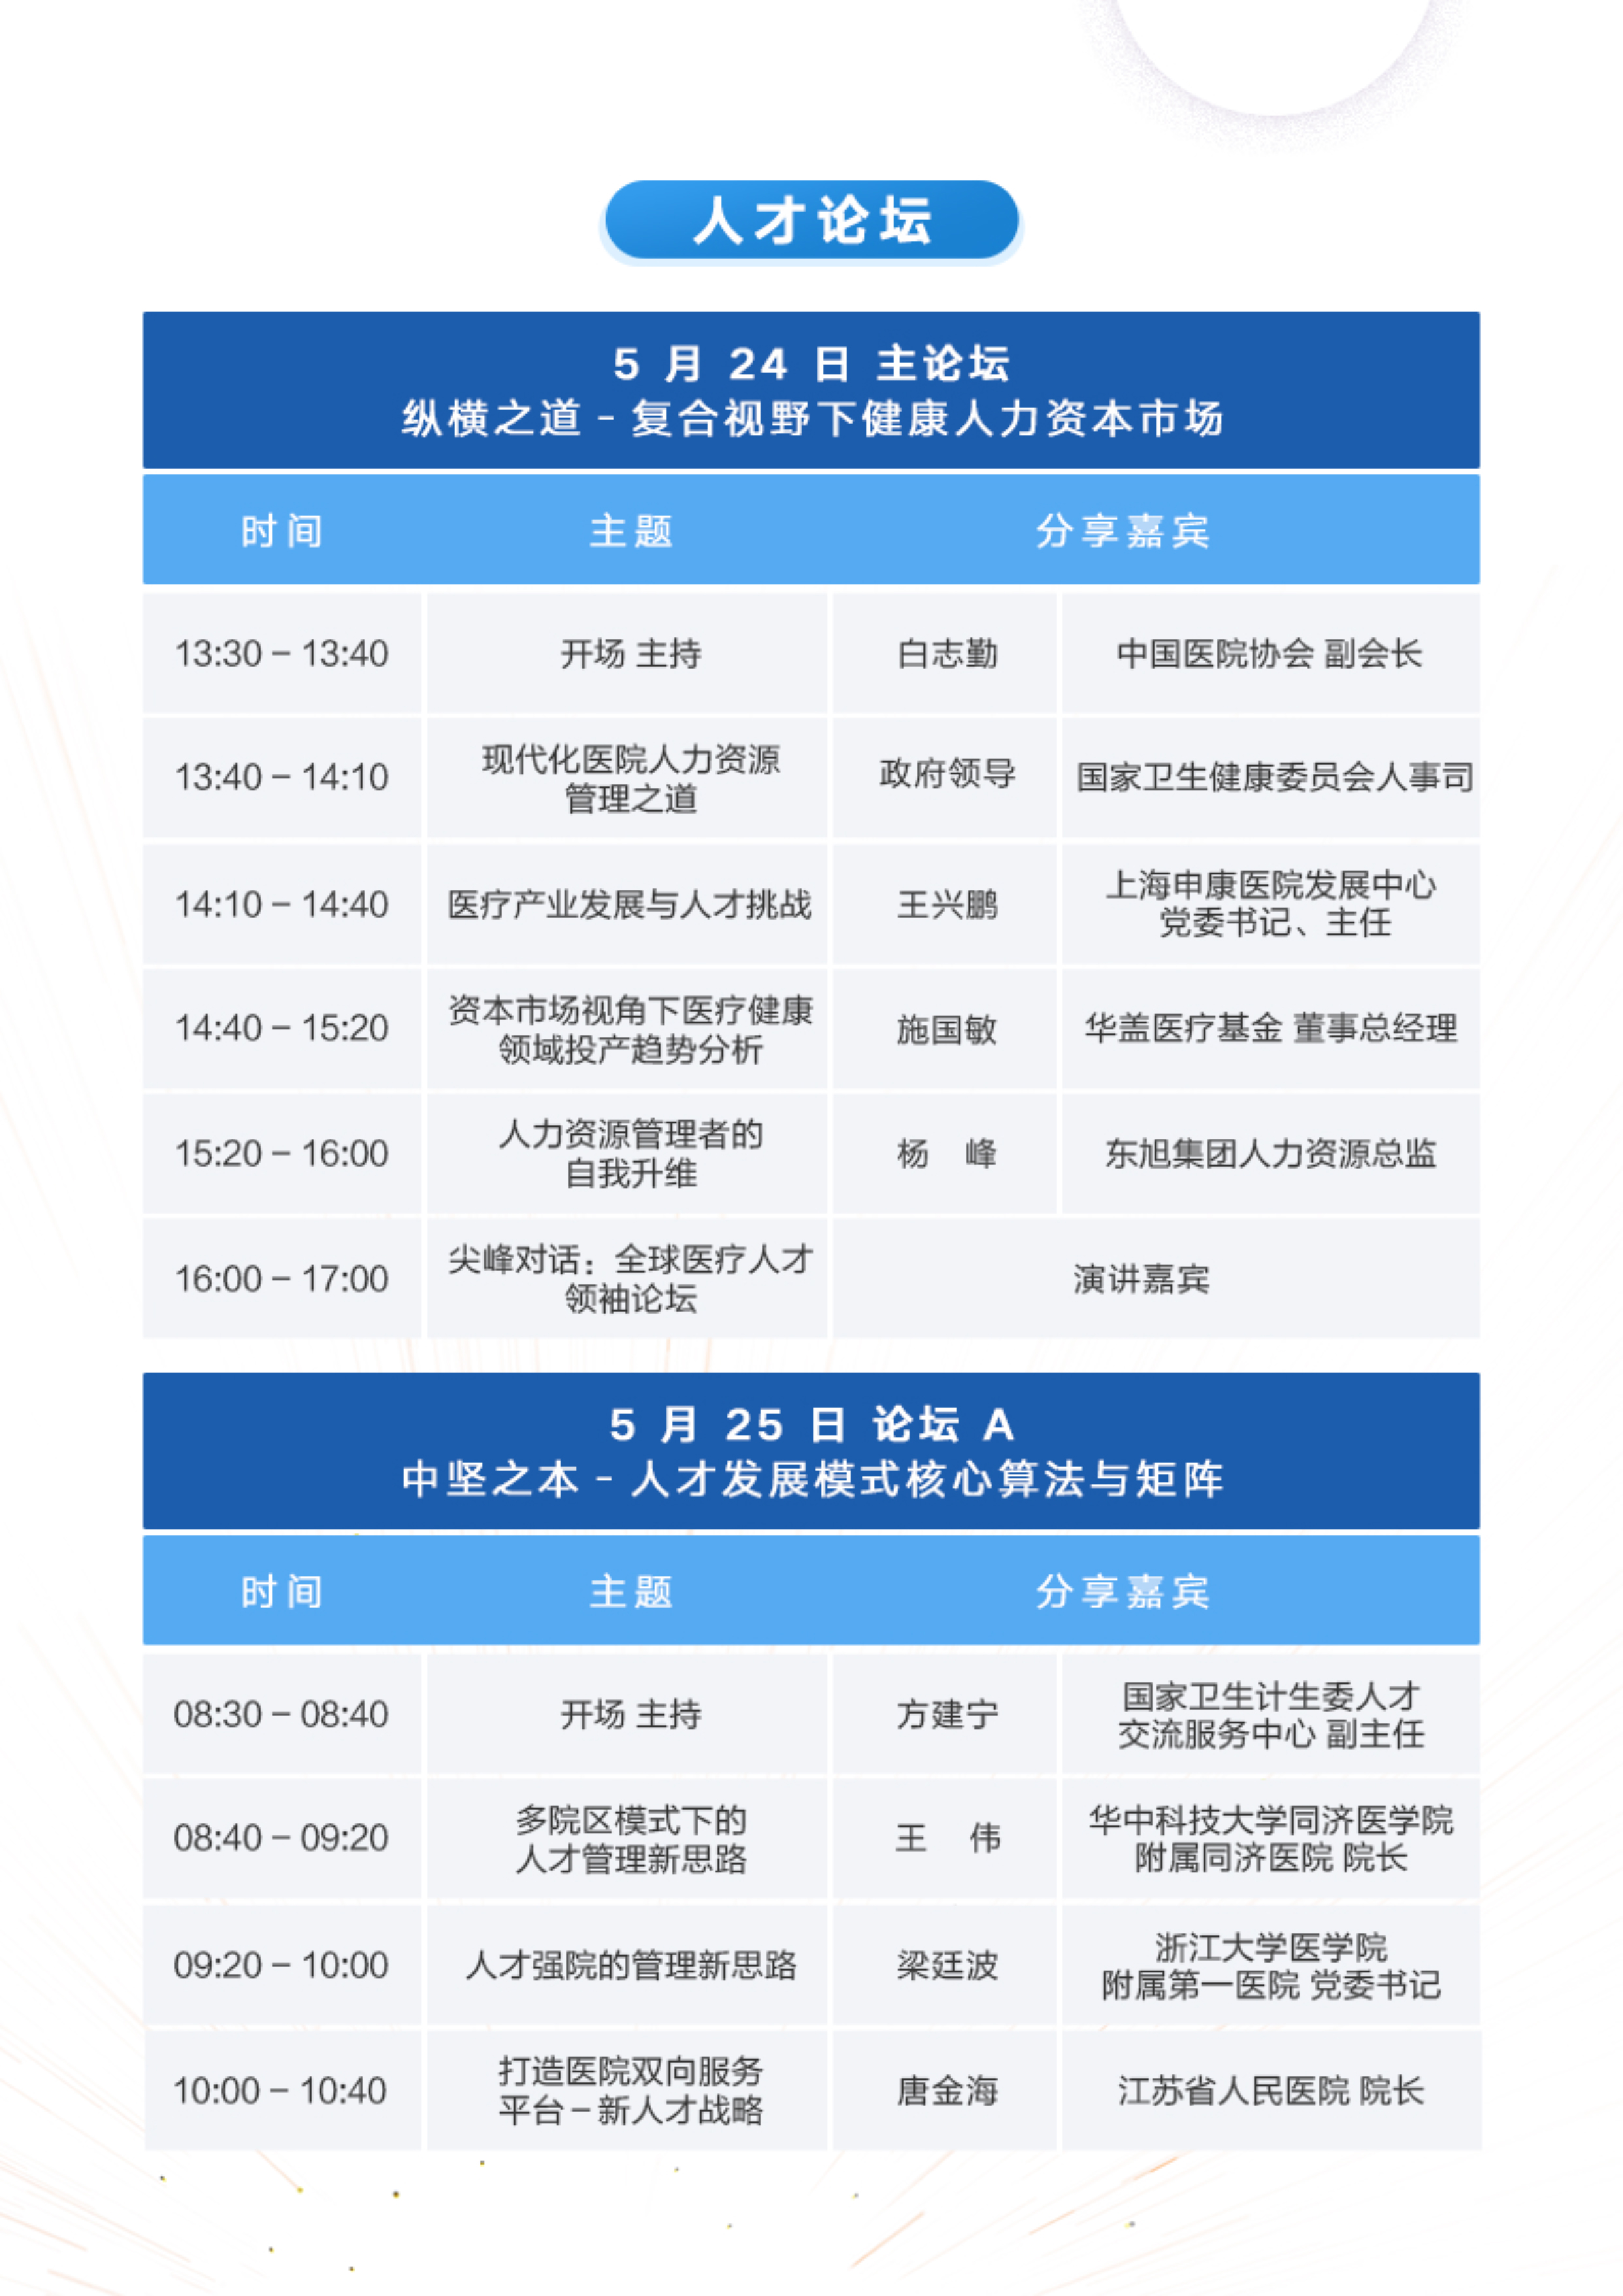 CHDC 2019中国医院发展大会(杭州)